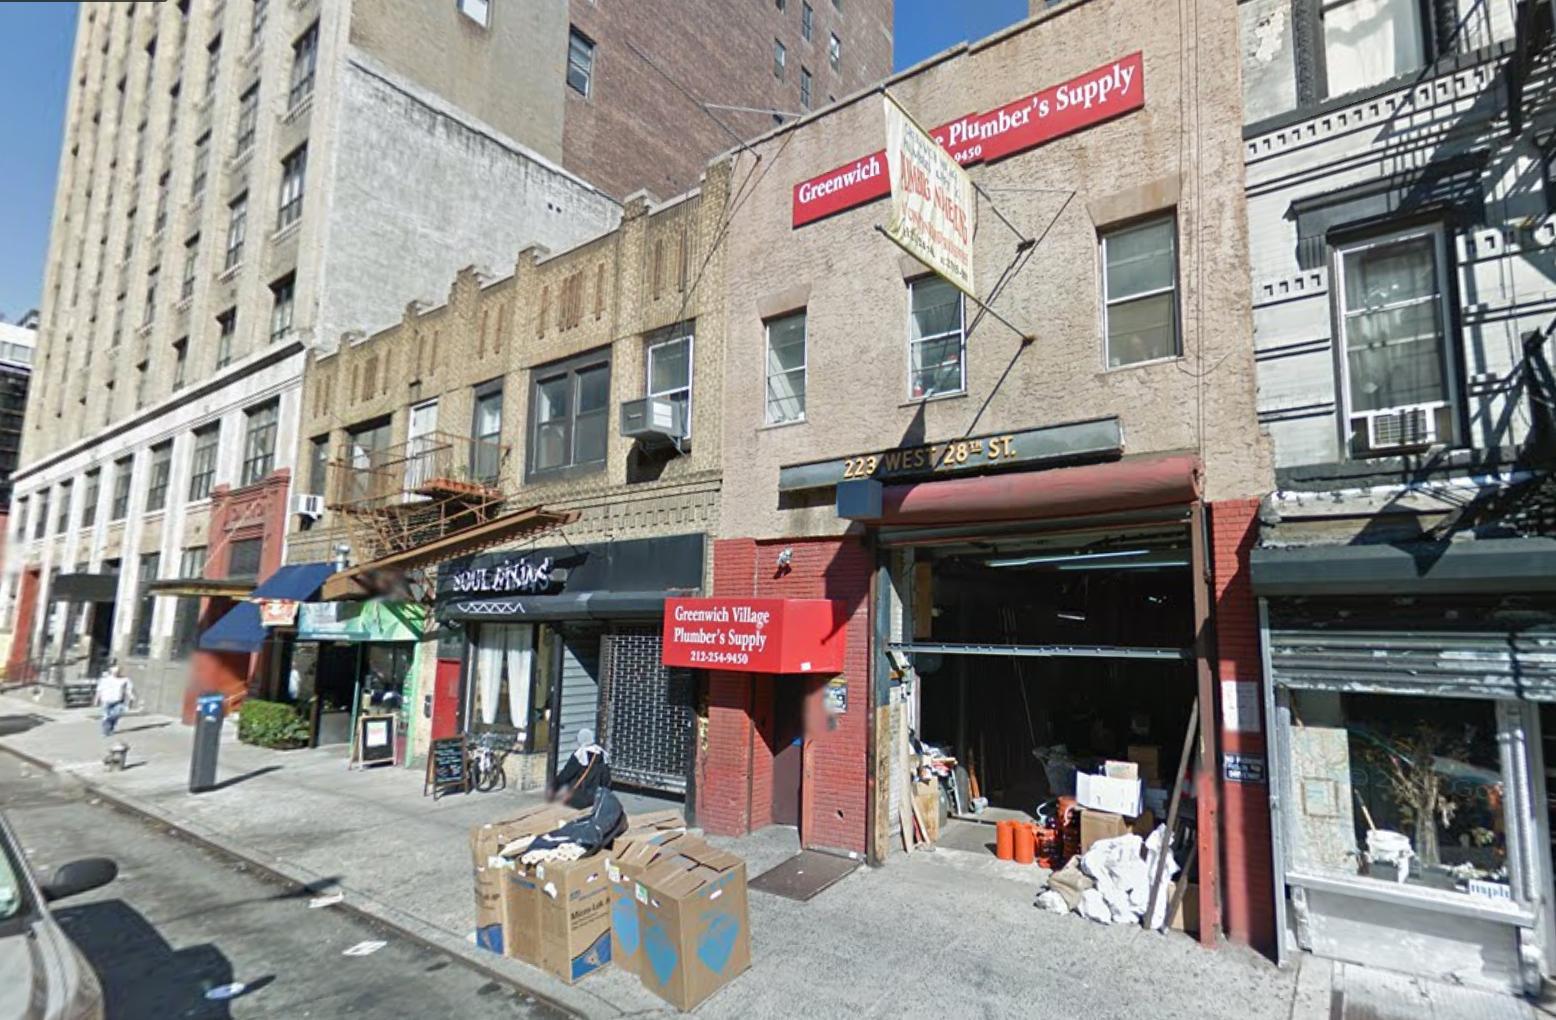 223-227 West 28th Street